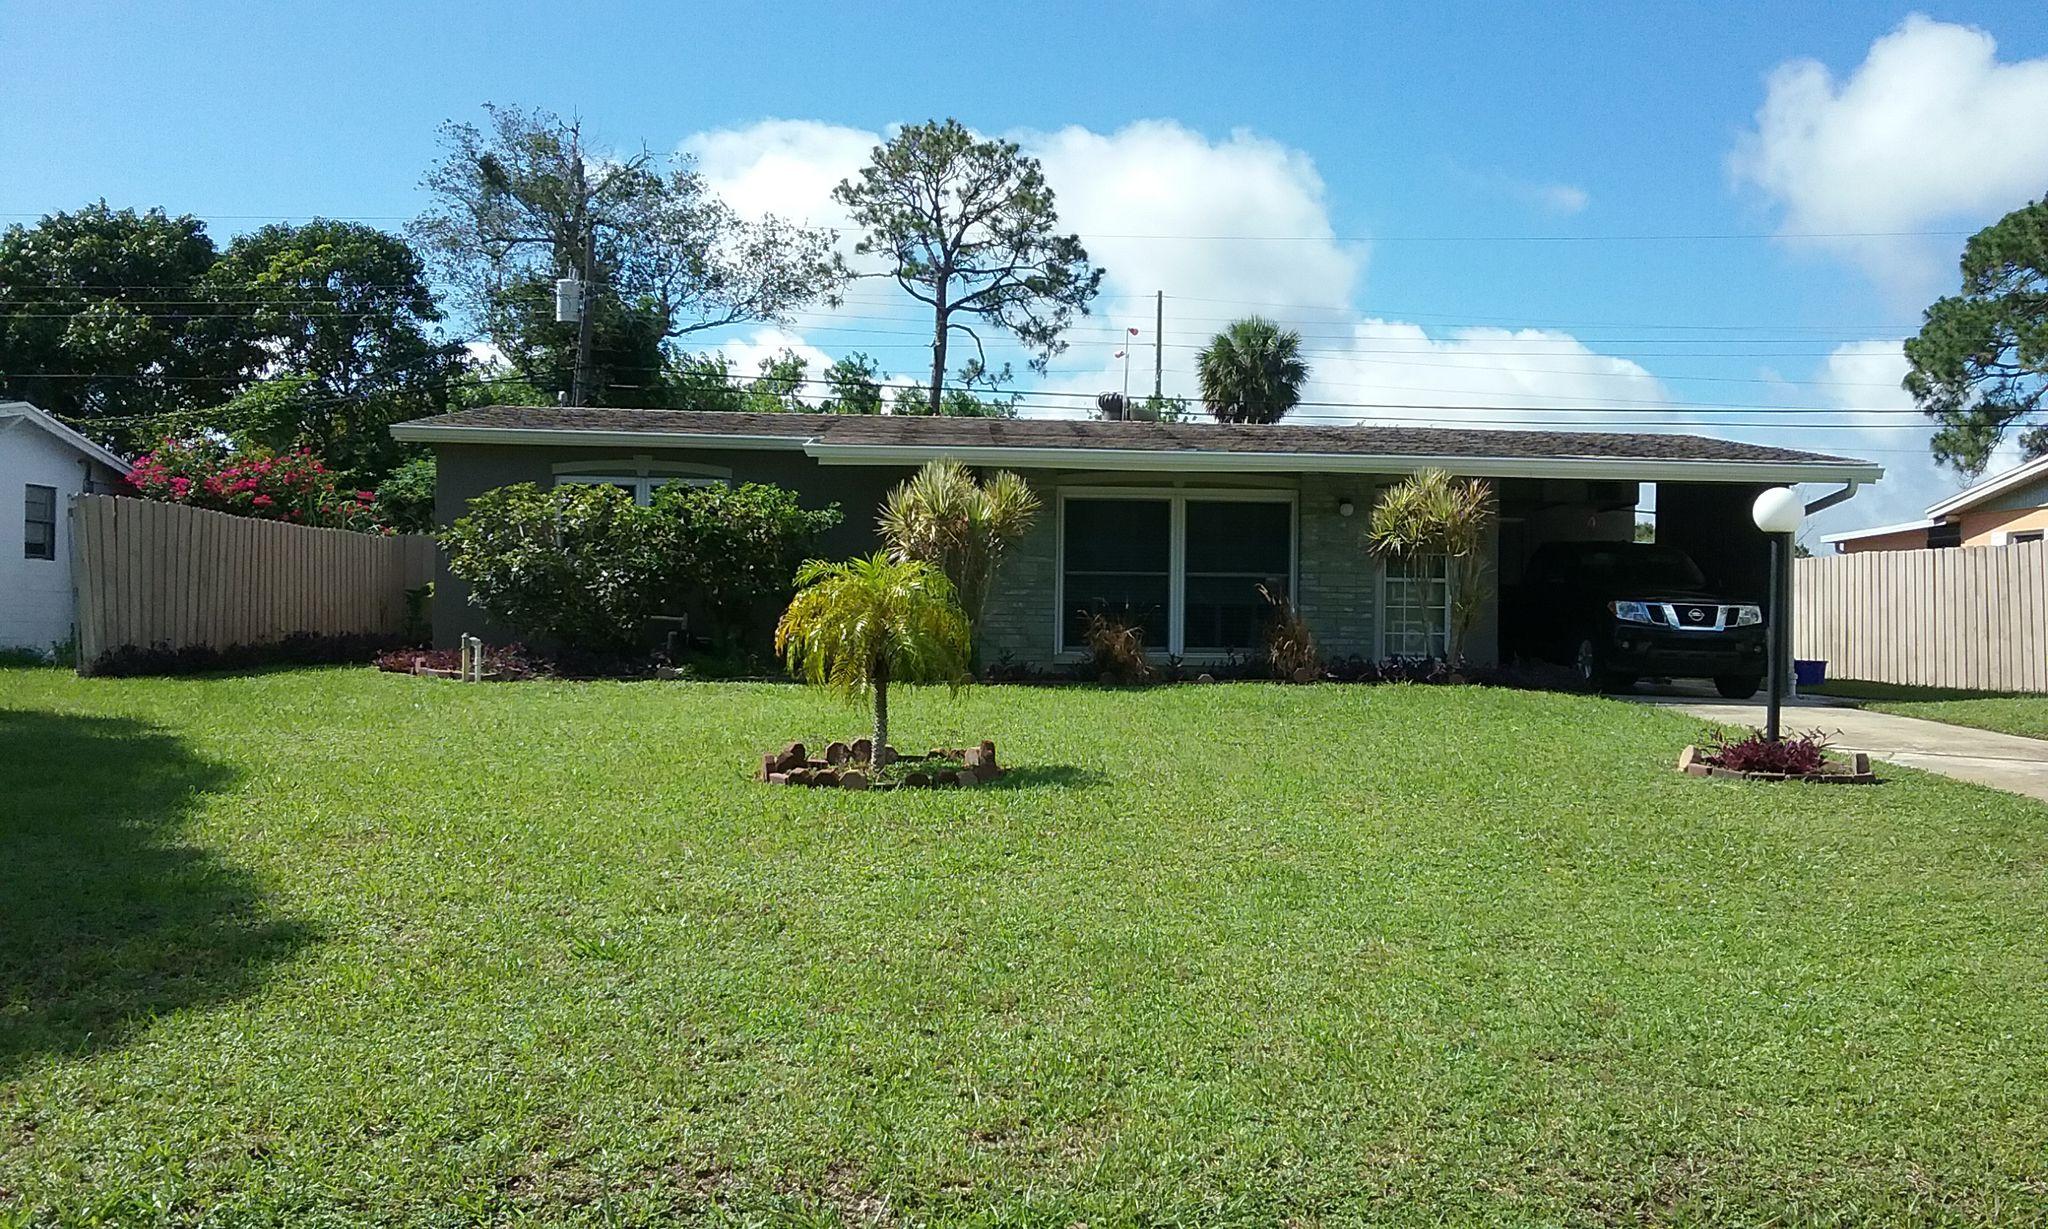 2233 3rd St SW, Vero Beach, FL 32962 - Estimate and Home Details ...